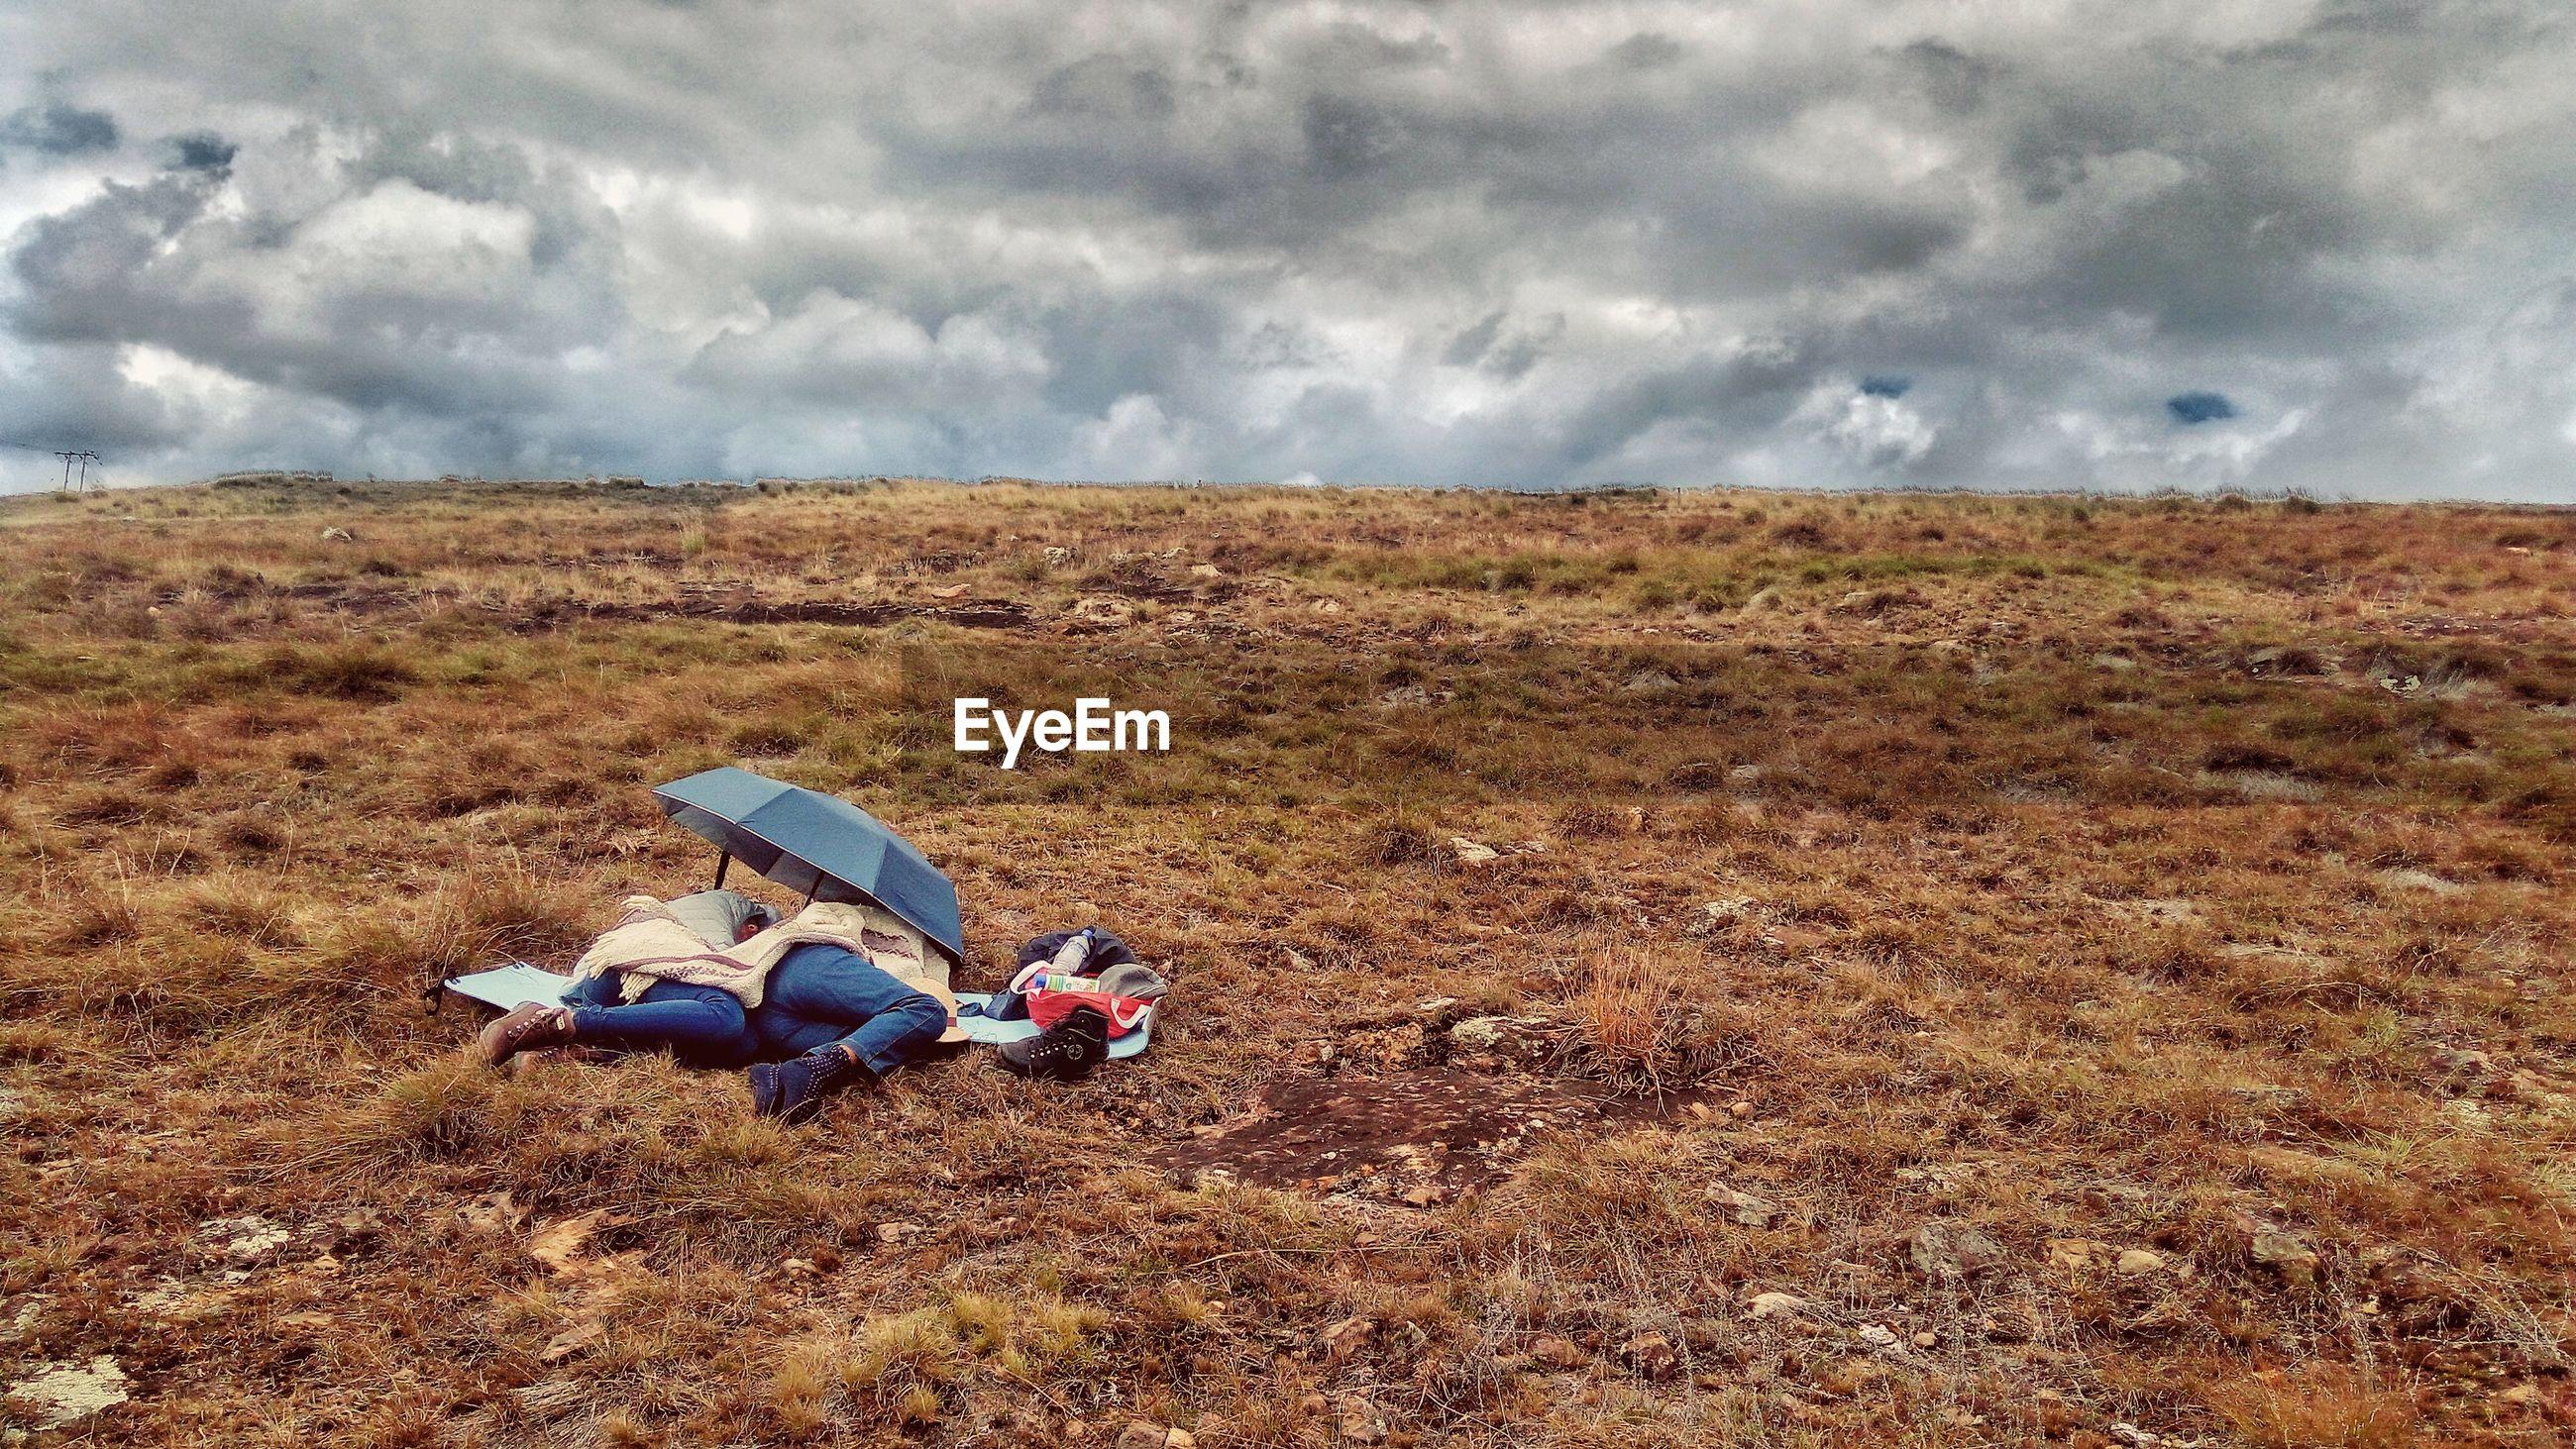 Women under umbrella sleeping on field against cloudy sky